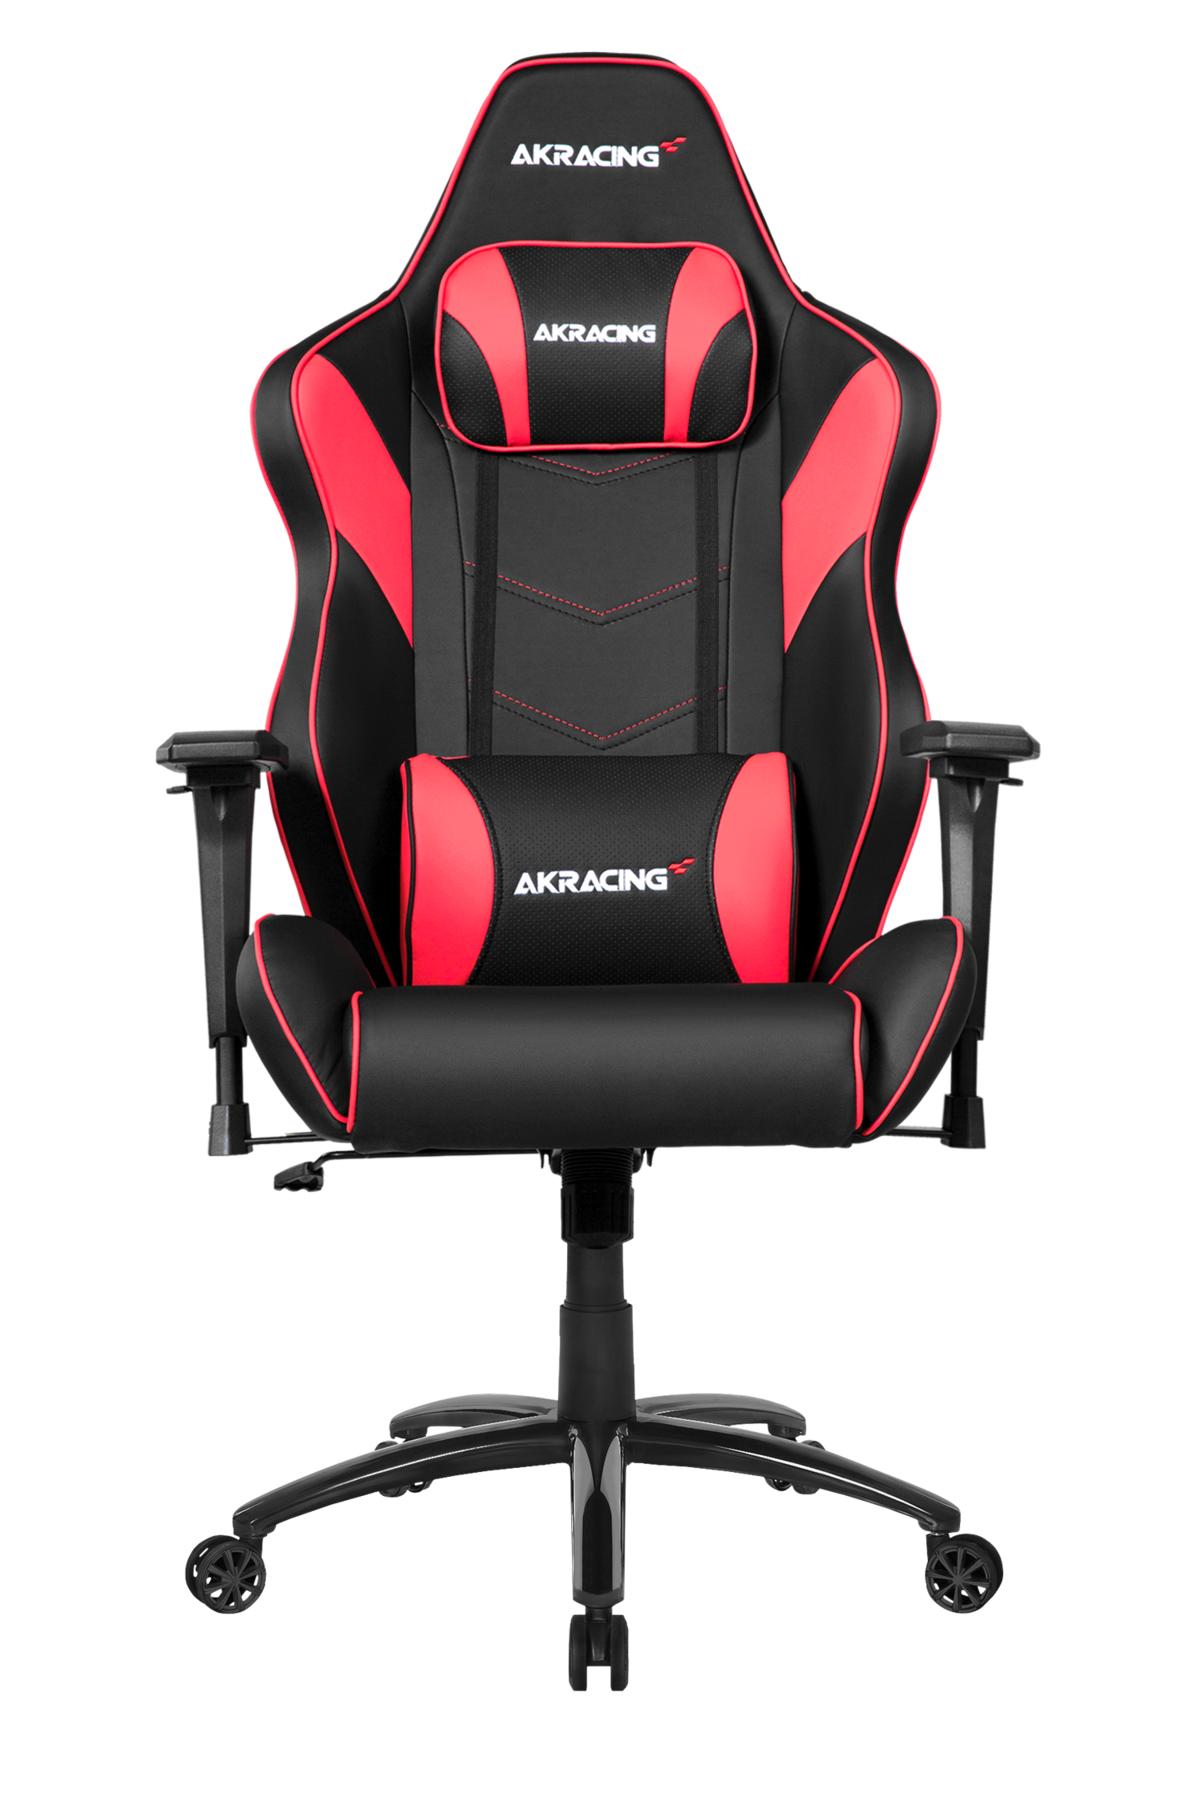 AKRacing LX PLus - PC-Gamingstuhl - PC - 150 kg - Gepolsterter - ausgestopfter Sitz - Gepolsterte - ausgestopfte Rückenlehne - Rennen